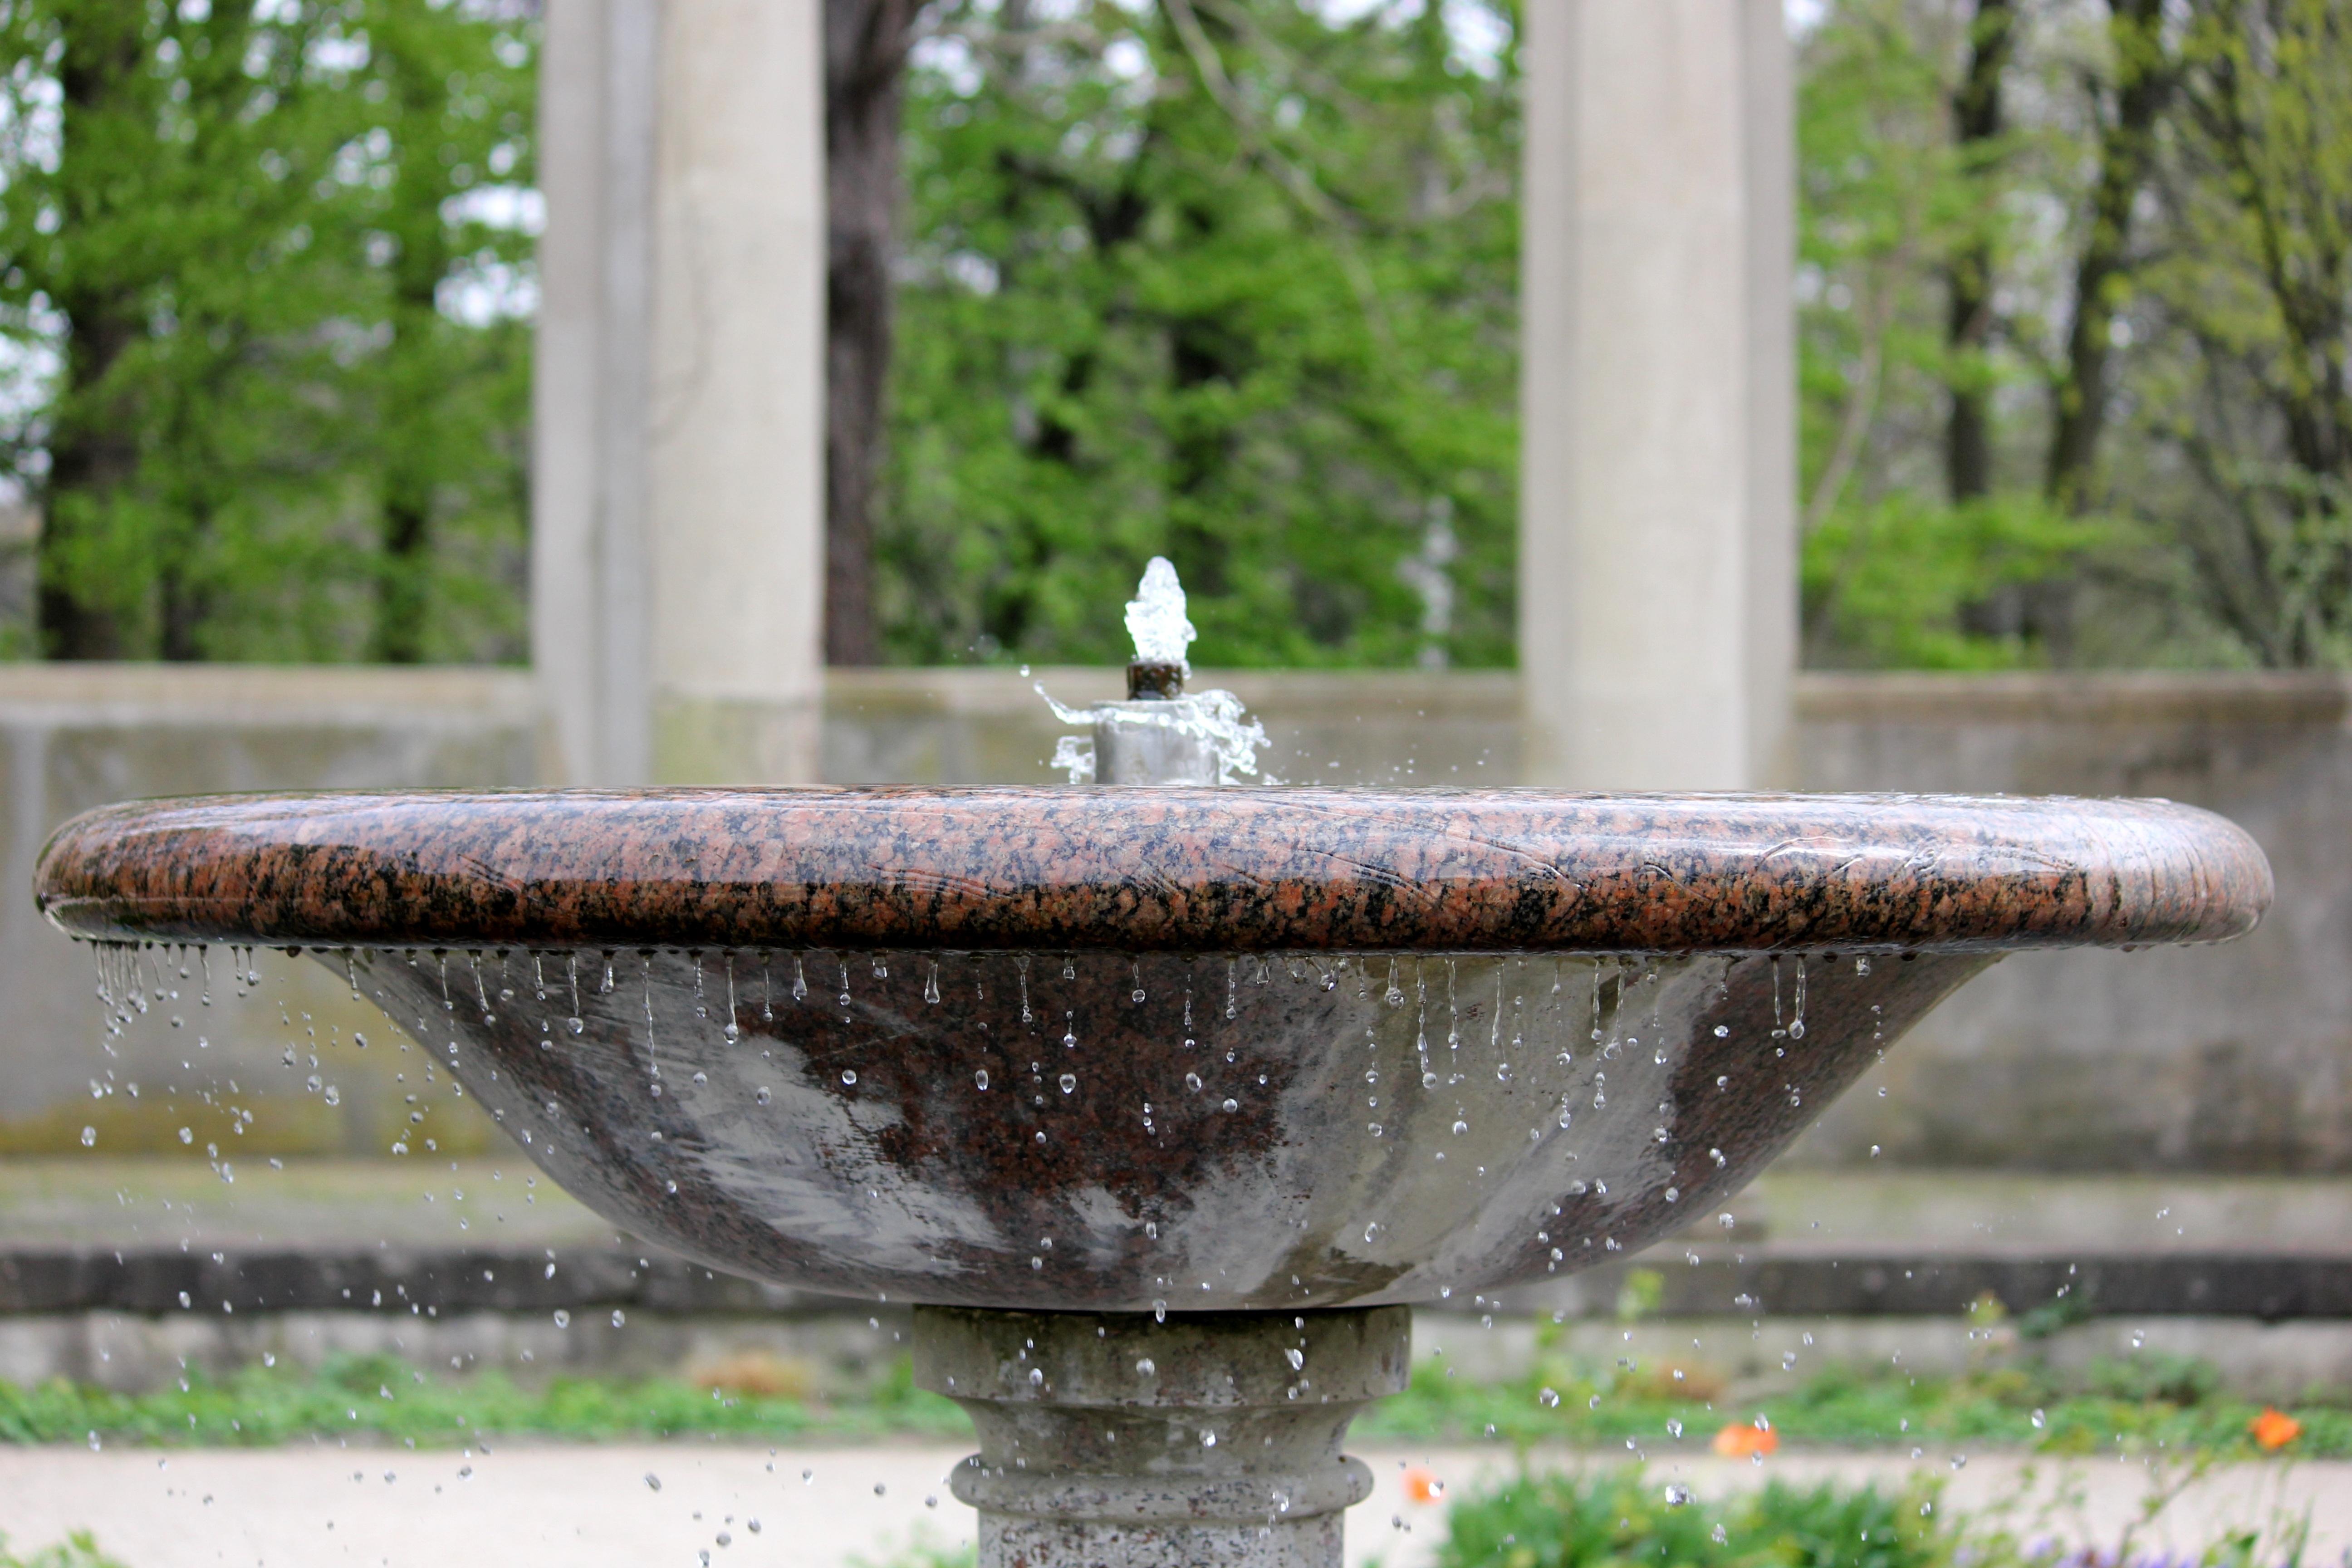 Water Flower Backyard Sink Garden Water Fountain Bubble Fountain Water  Feature Decorative Fountains Well Water